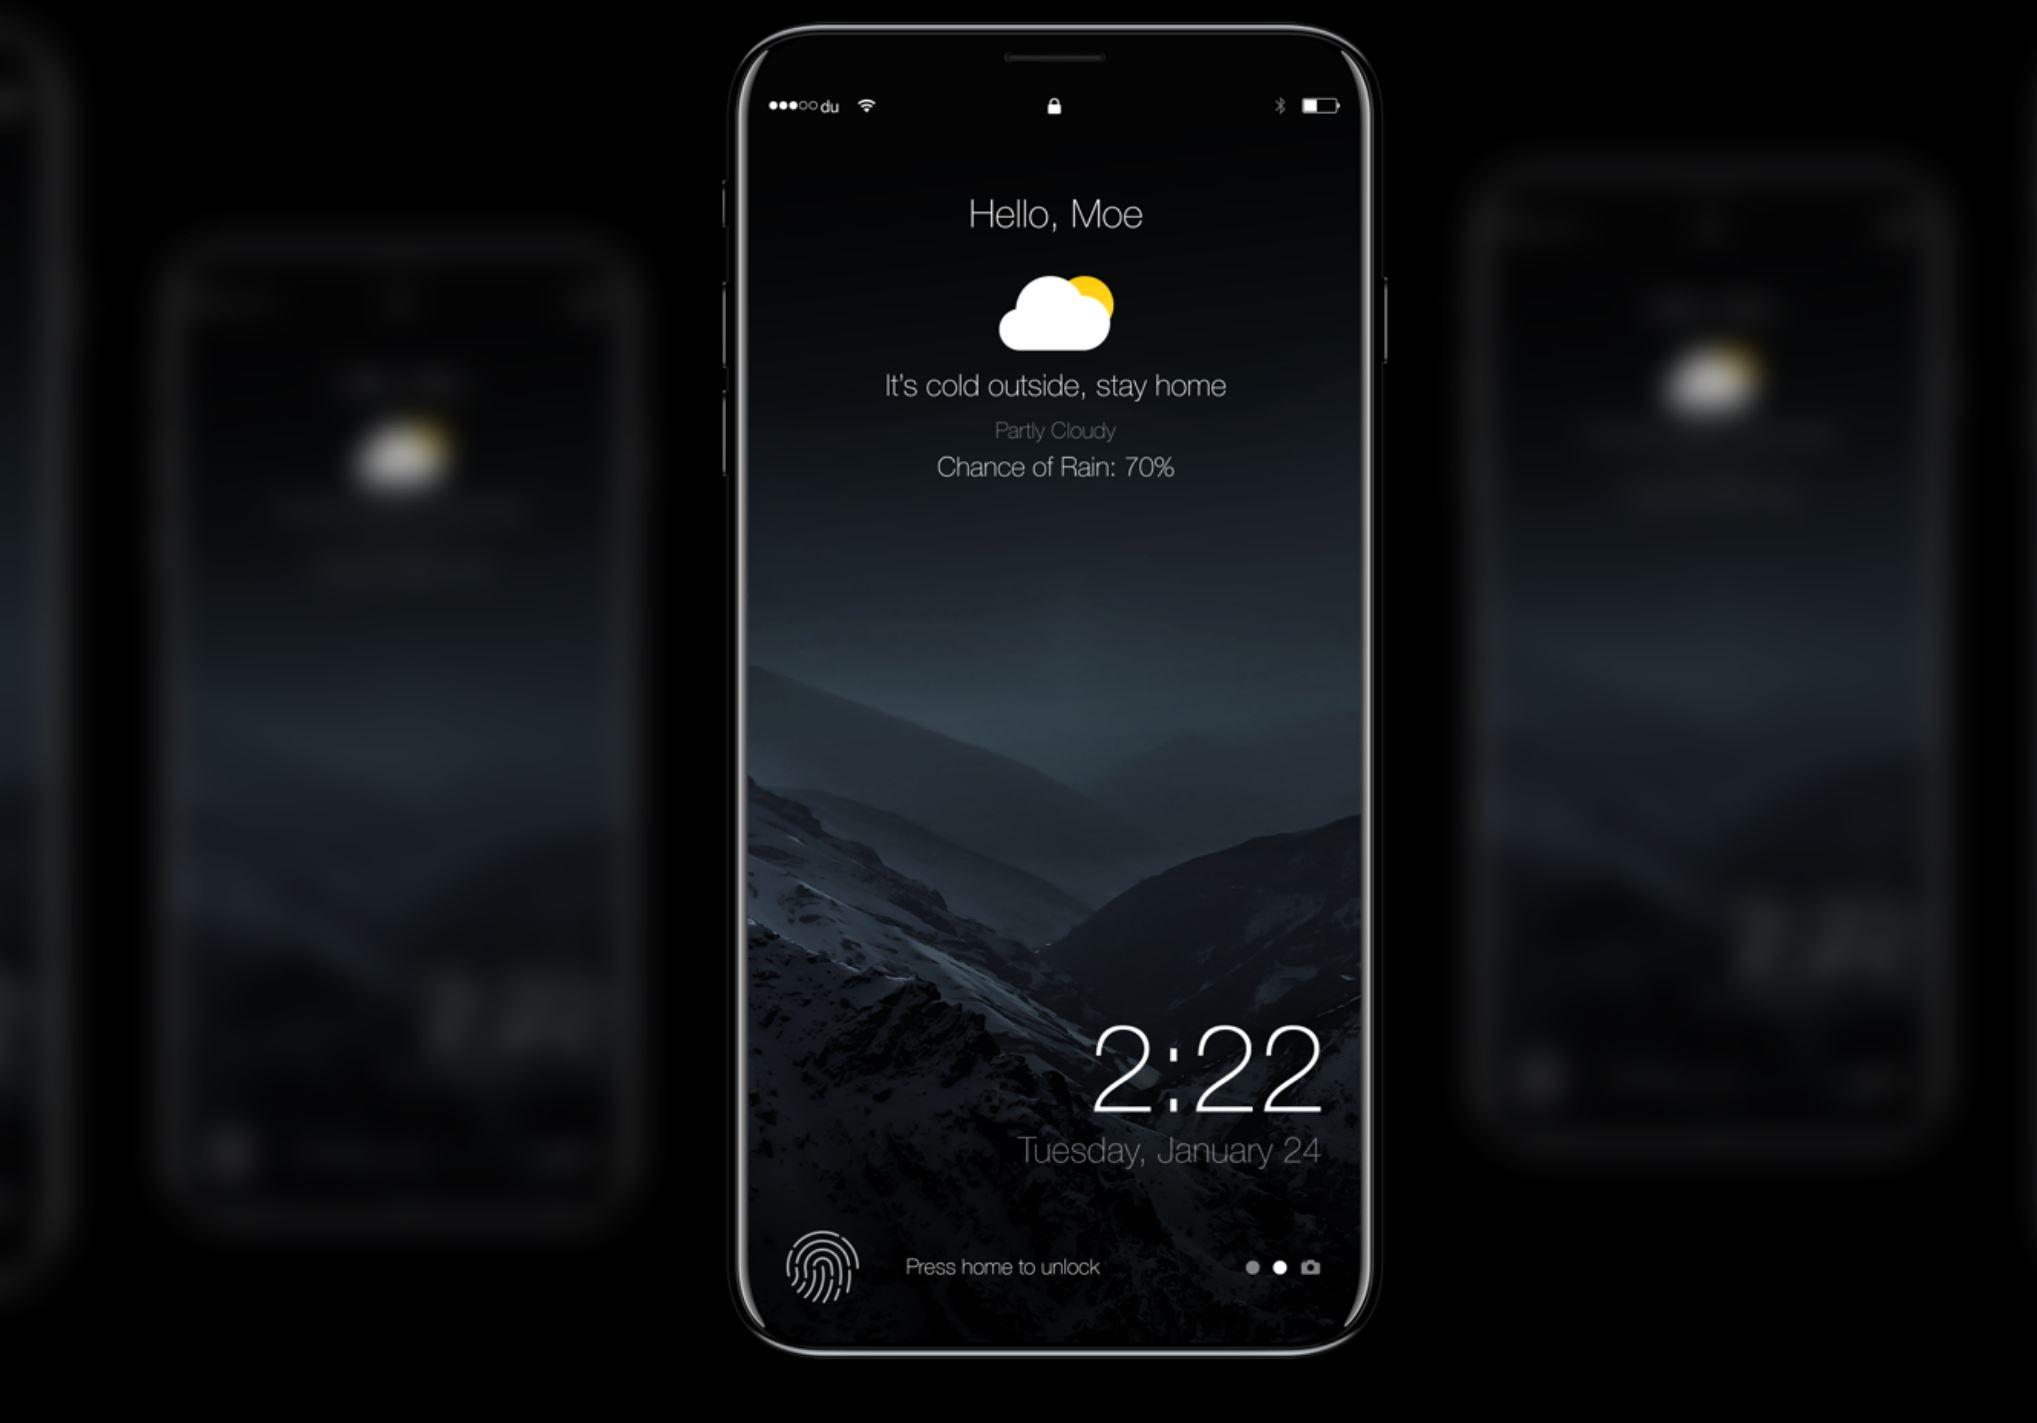 3d Depth Wallpaper S8 Iphone 8 Reported To Get Revolutionary Front Camera Sensor